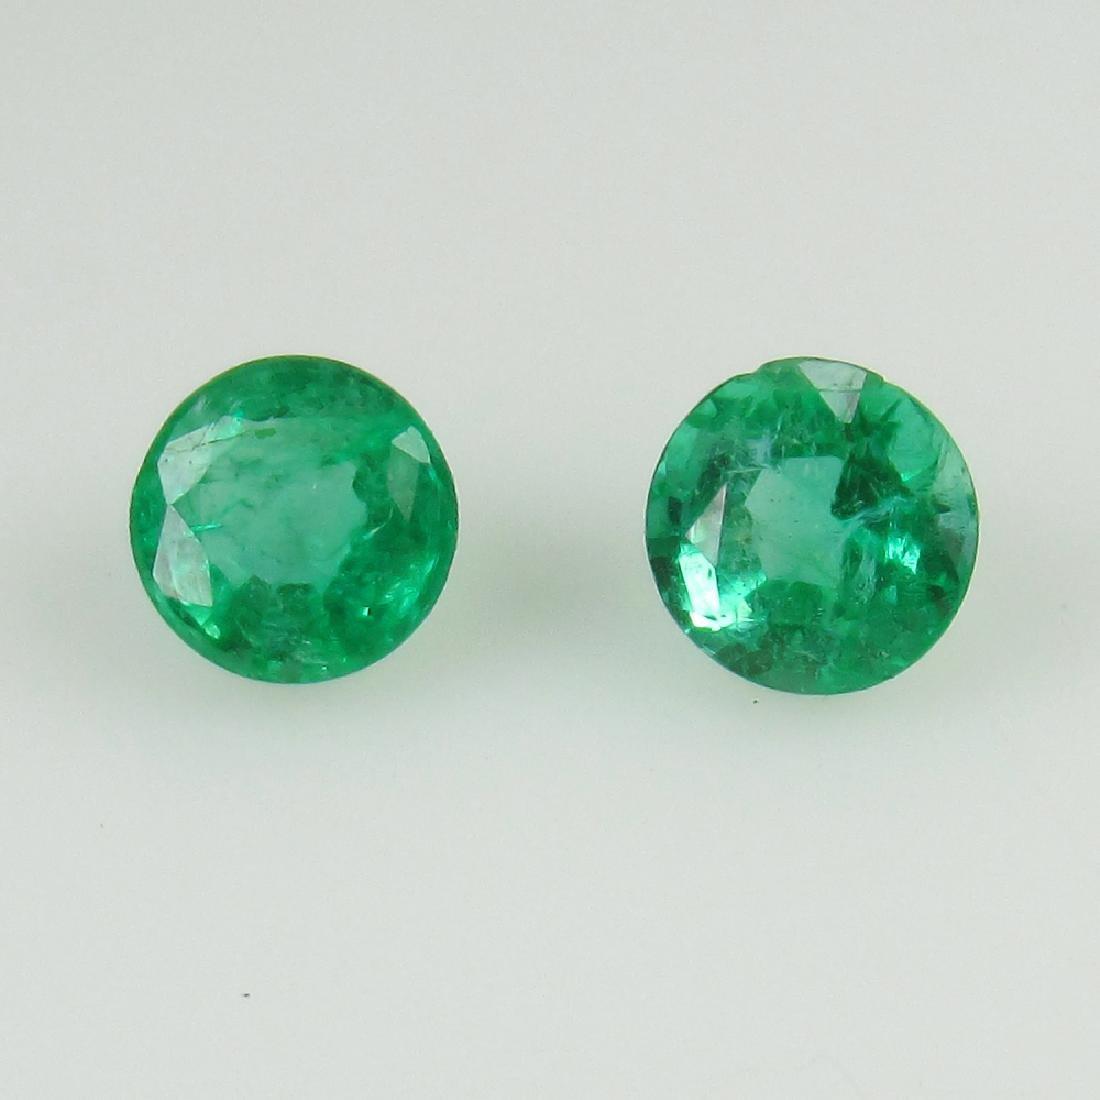 0.58 Ct Genuine Loose Zambian Emerald 4.2 mm Round Pair